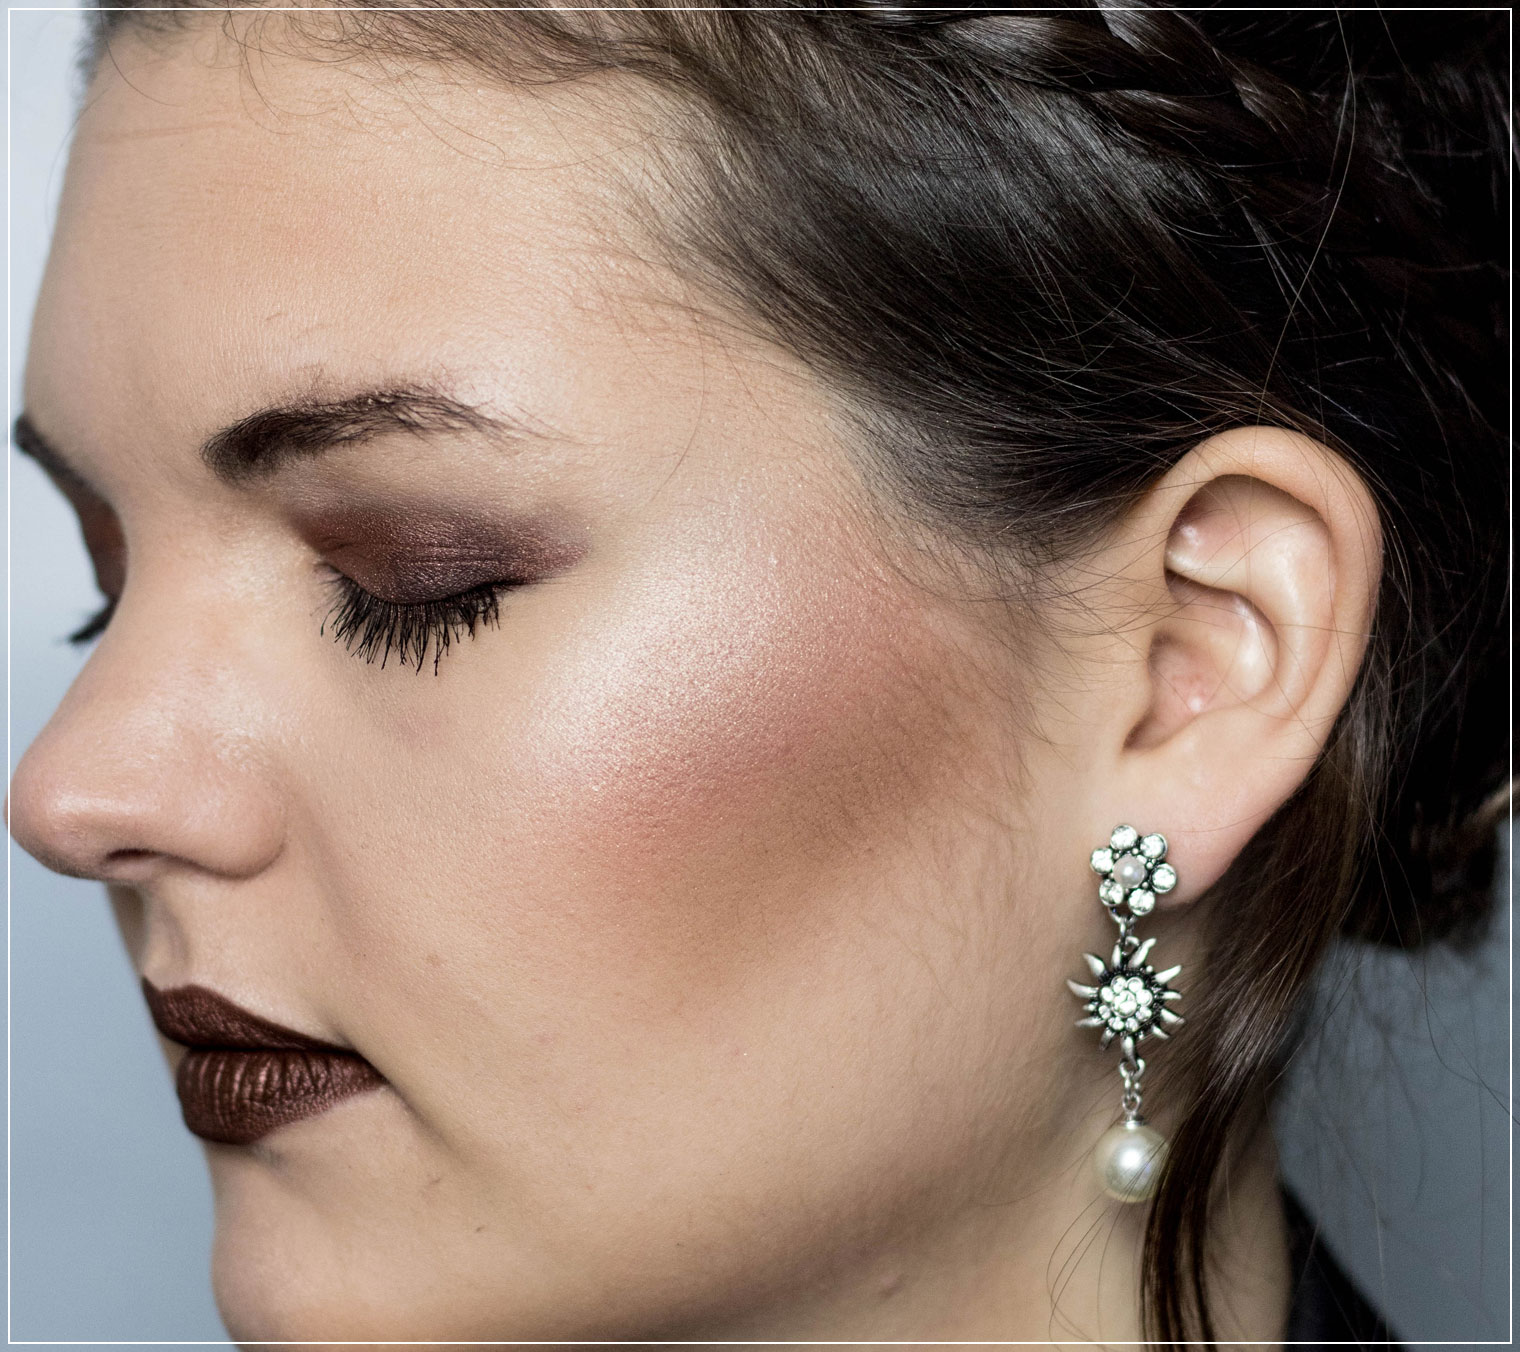 Herbst Make-Up, Make-Up Tutorial, Autumn Make-Up, Lidschattenpalette, Naked Heat Palette, Urban Decay, Naked Heat Review, Metallic Braun, NYX Liquid Suede, New Era